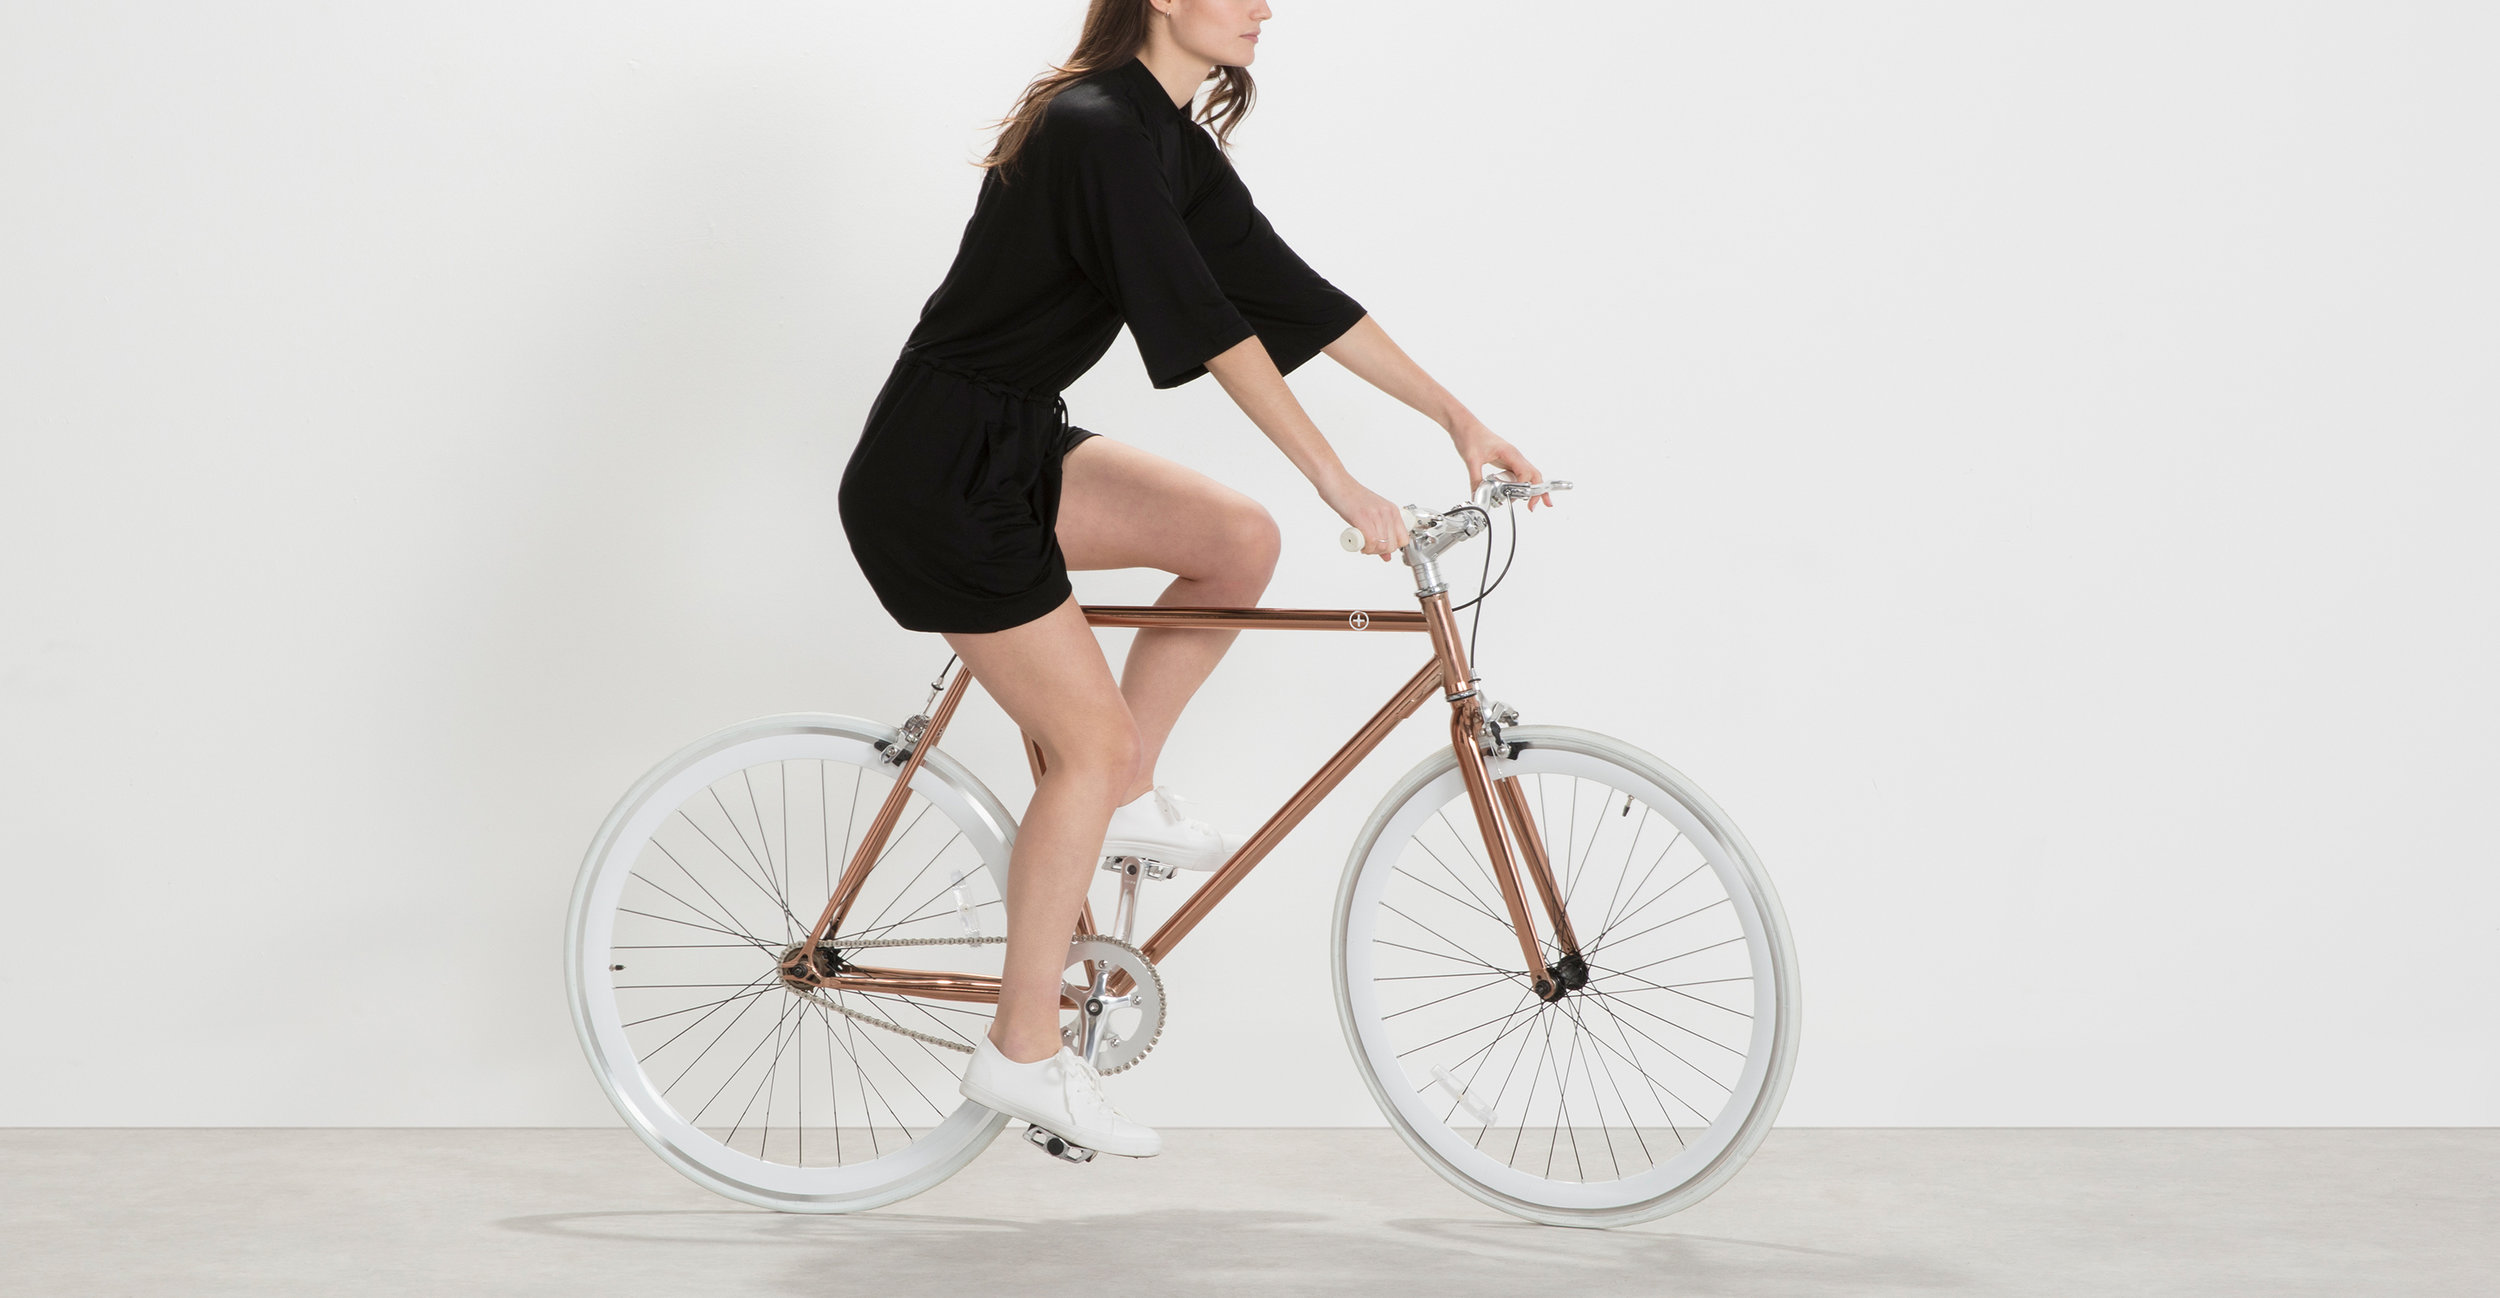 BIKMLW001COP-UK_Mallow_Single_Speed_City_Bike_Copper_White_SM_LB02.jpg